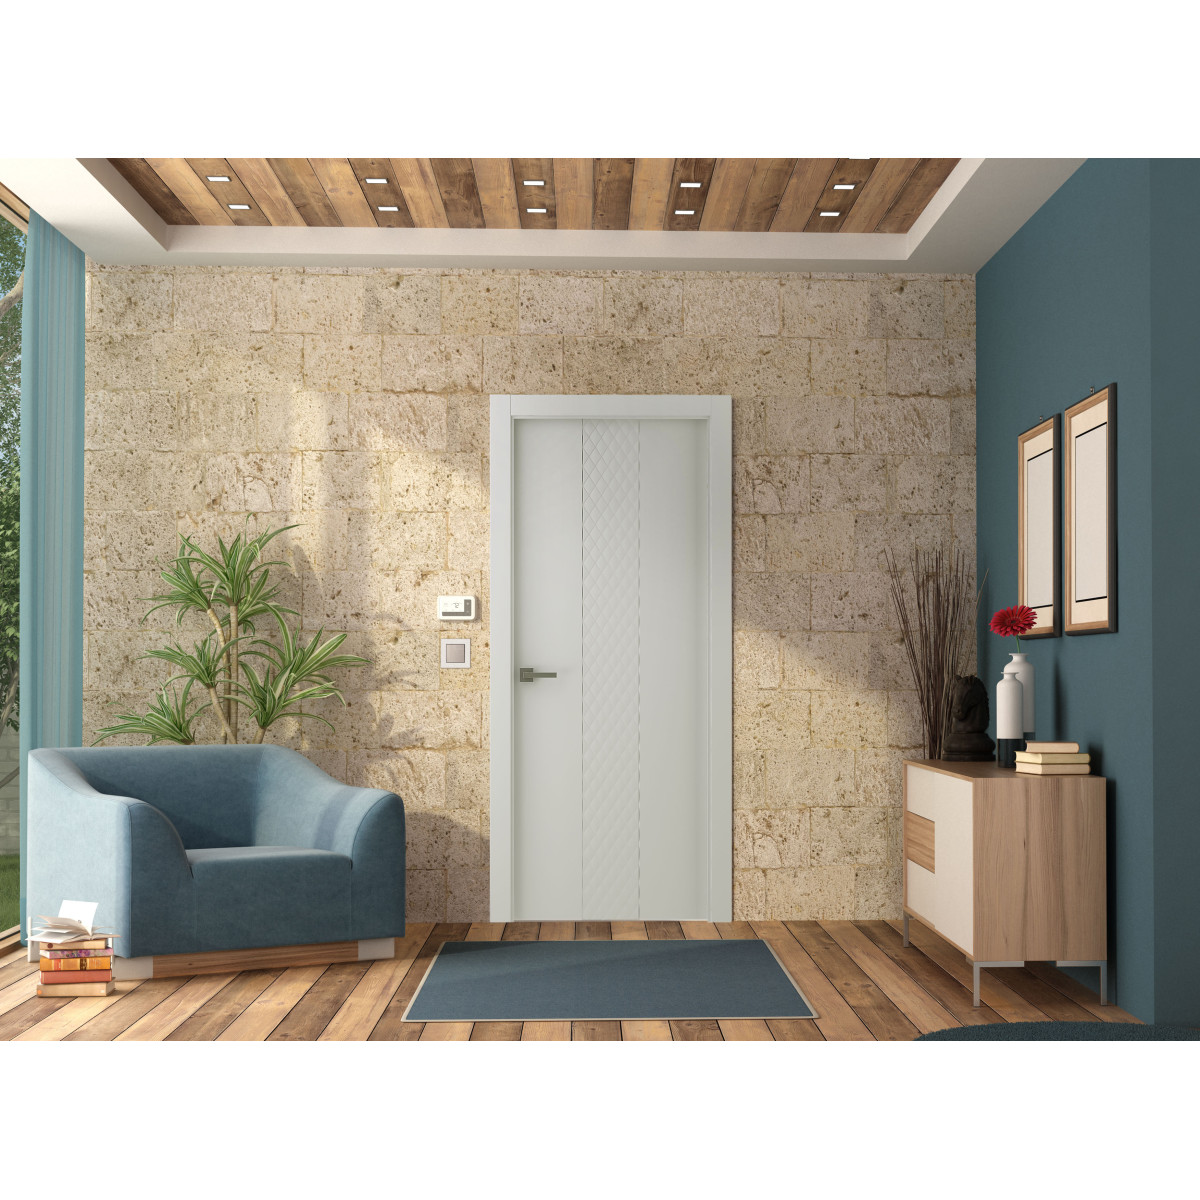 Дверь Межкомнатная Глухая С Замком В Комплекте Халика 90x200 Экошпон Цвет Белый